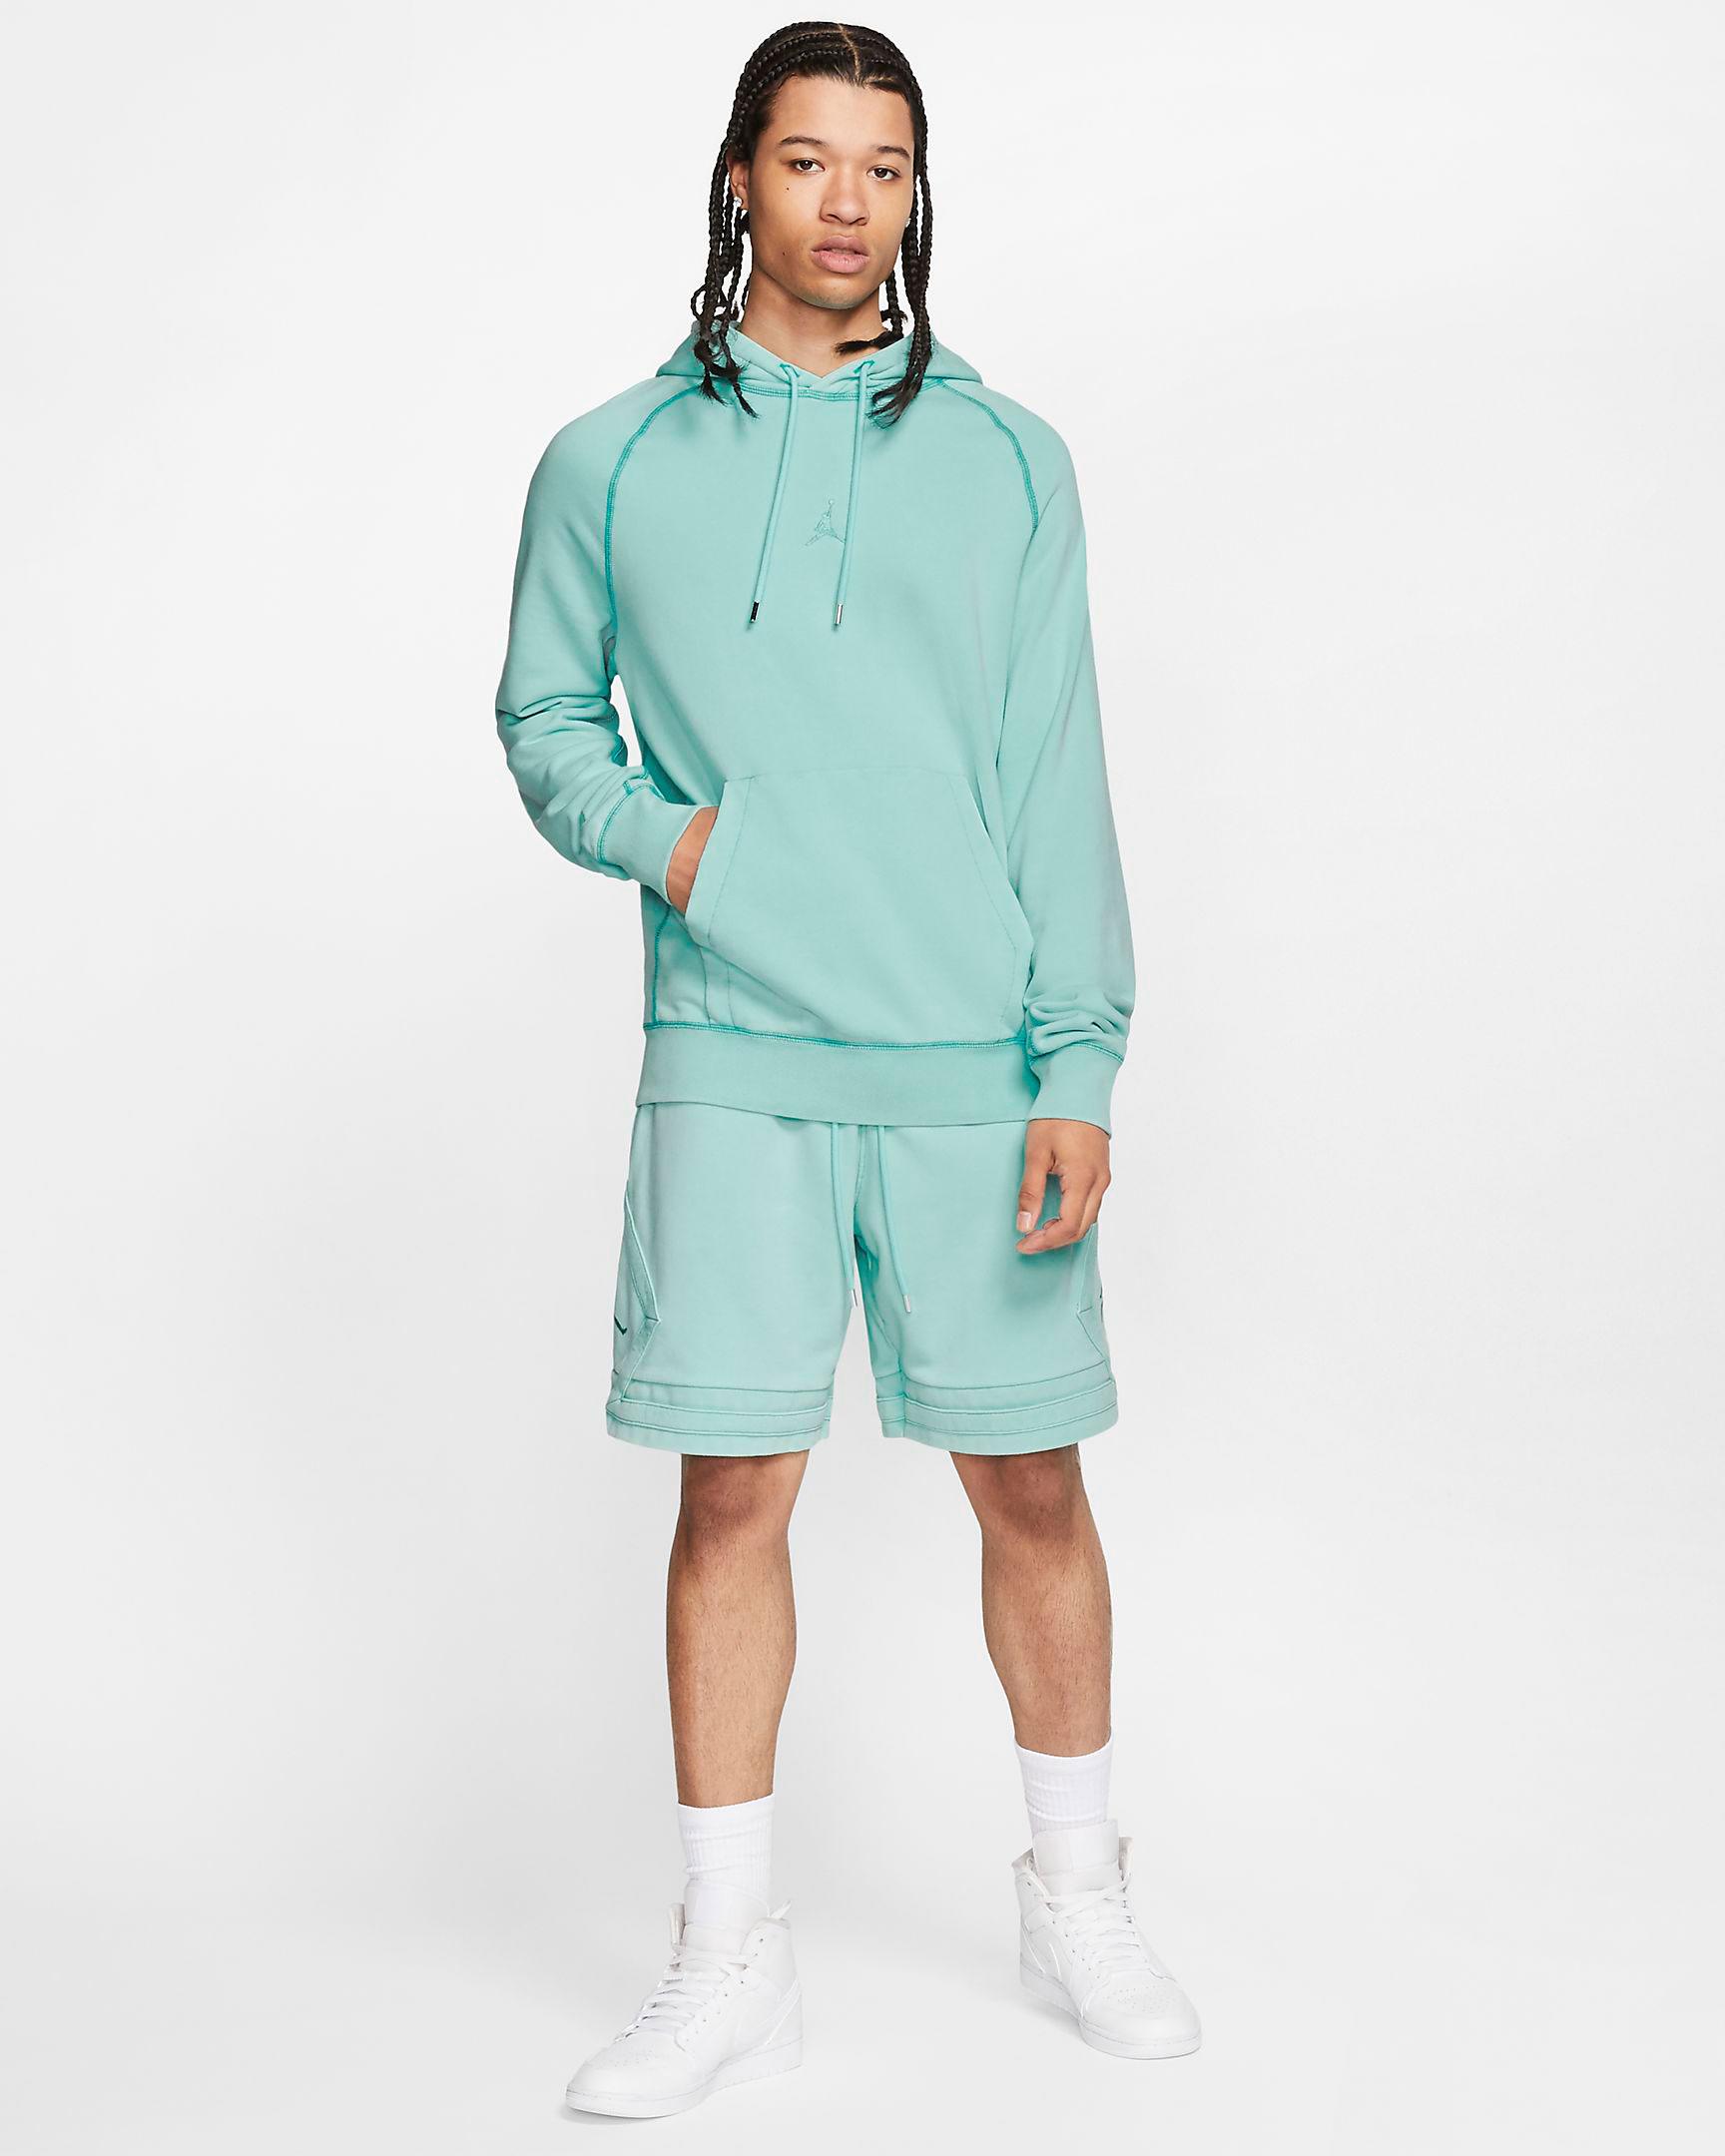 jordan-wings-washed-aqua-clothing